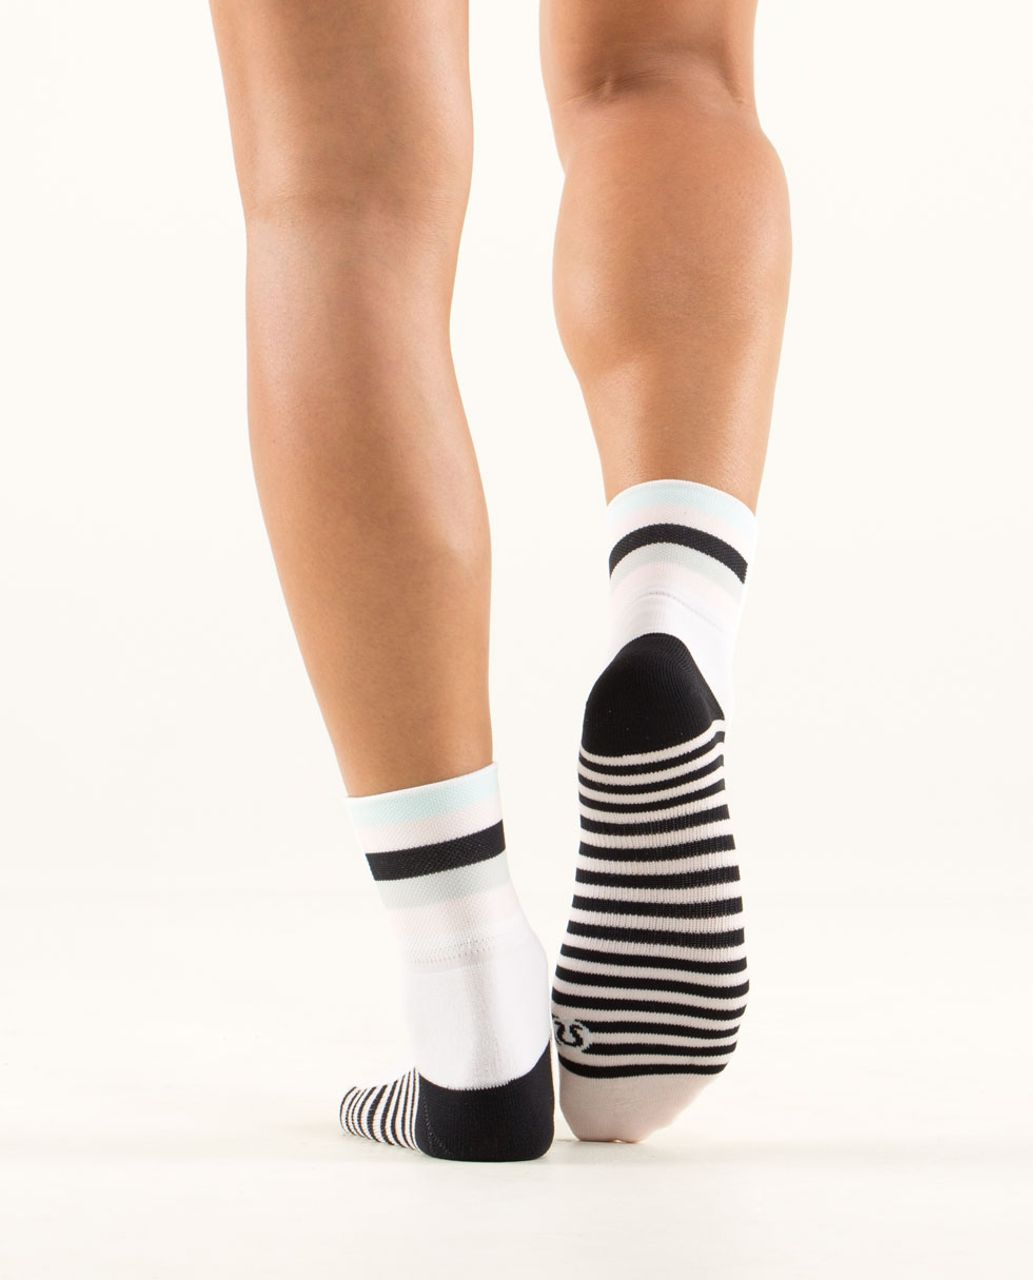 Lululemon Pedal Pusher Cycling Sock - Finish Line Stripe Parfait Pink